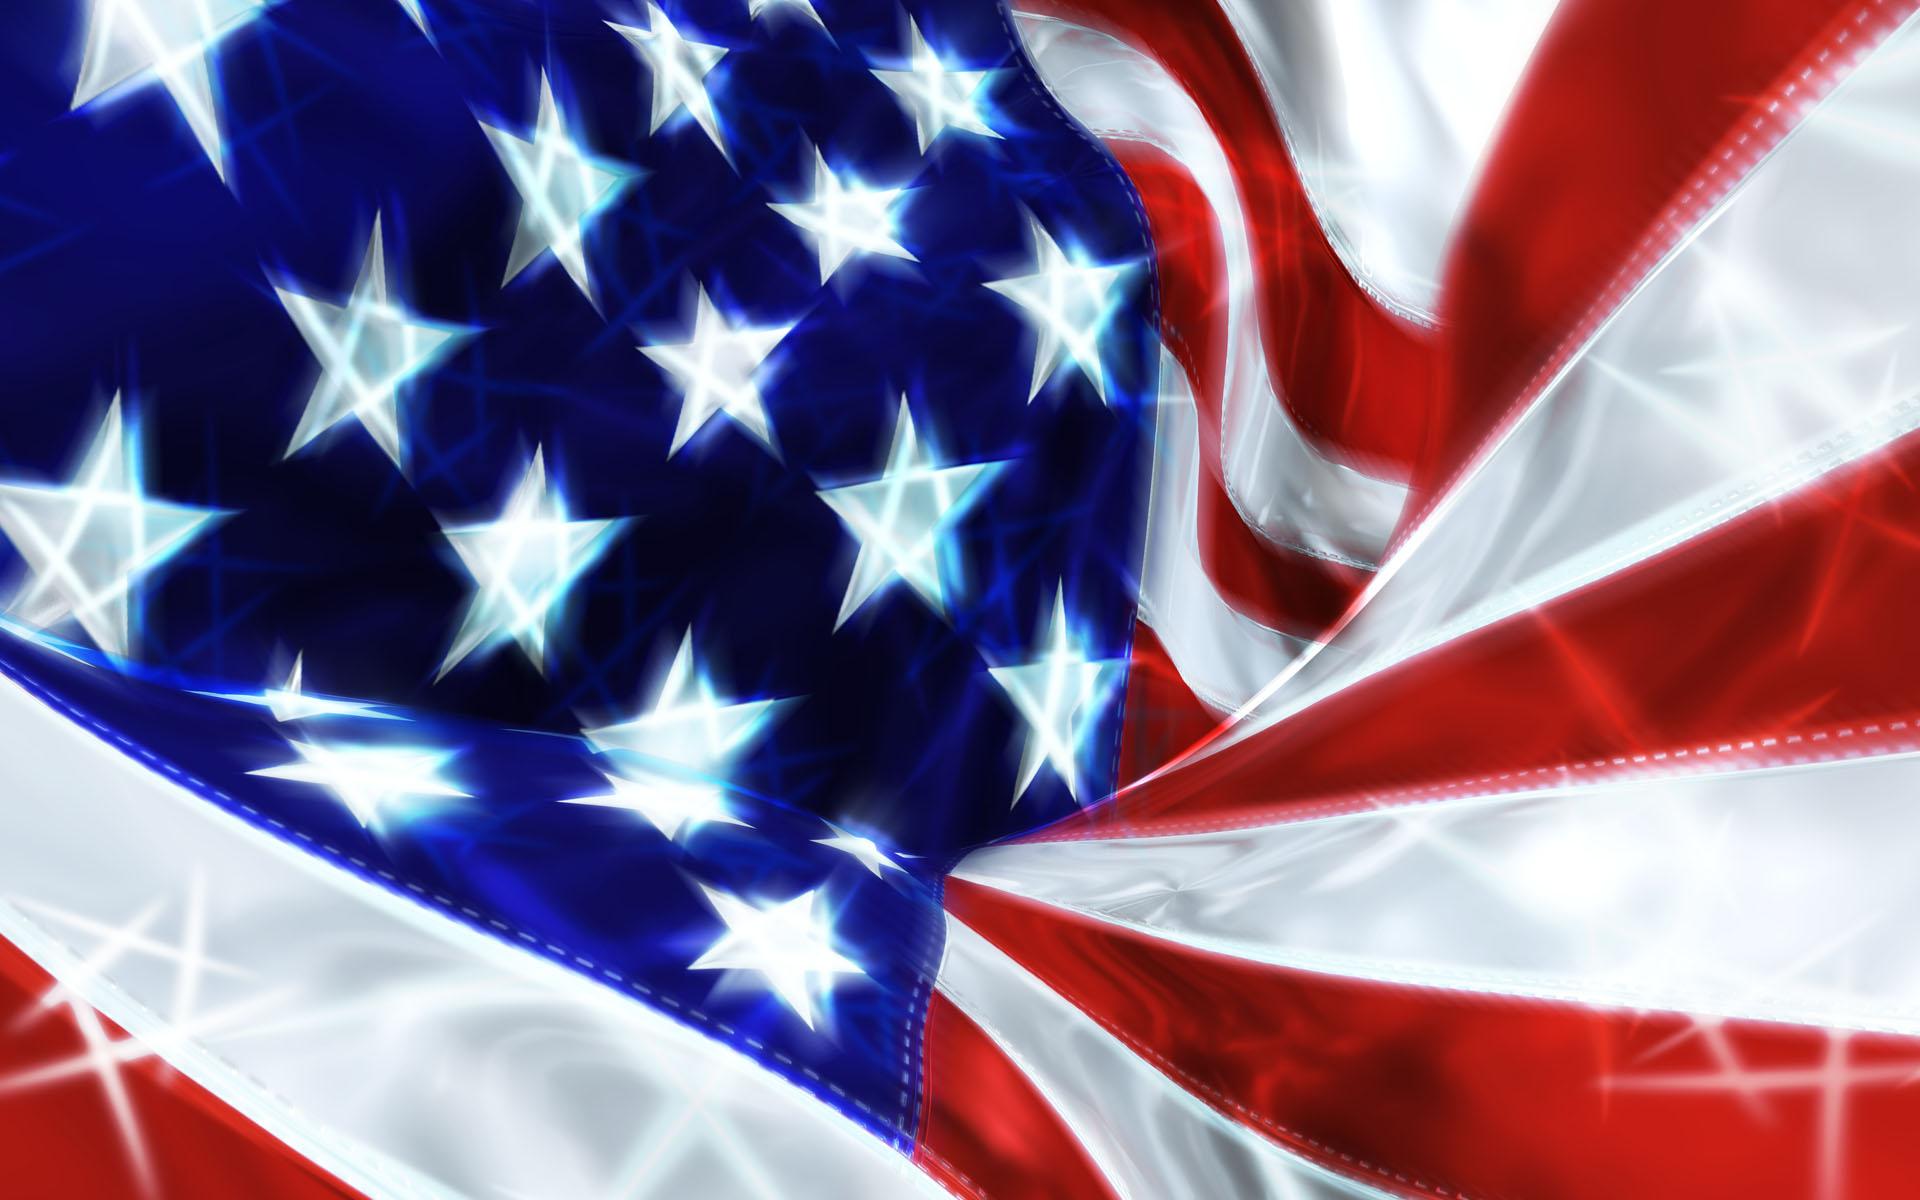 Digital American Flag Wallpaper for computers cute Wallpapers 1920x1200